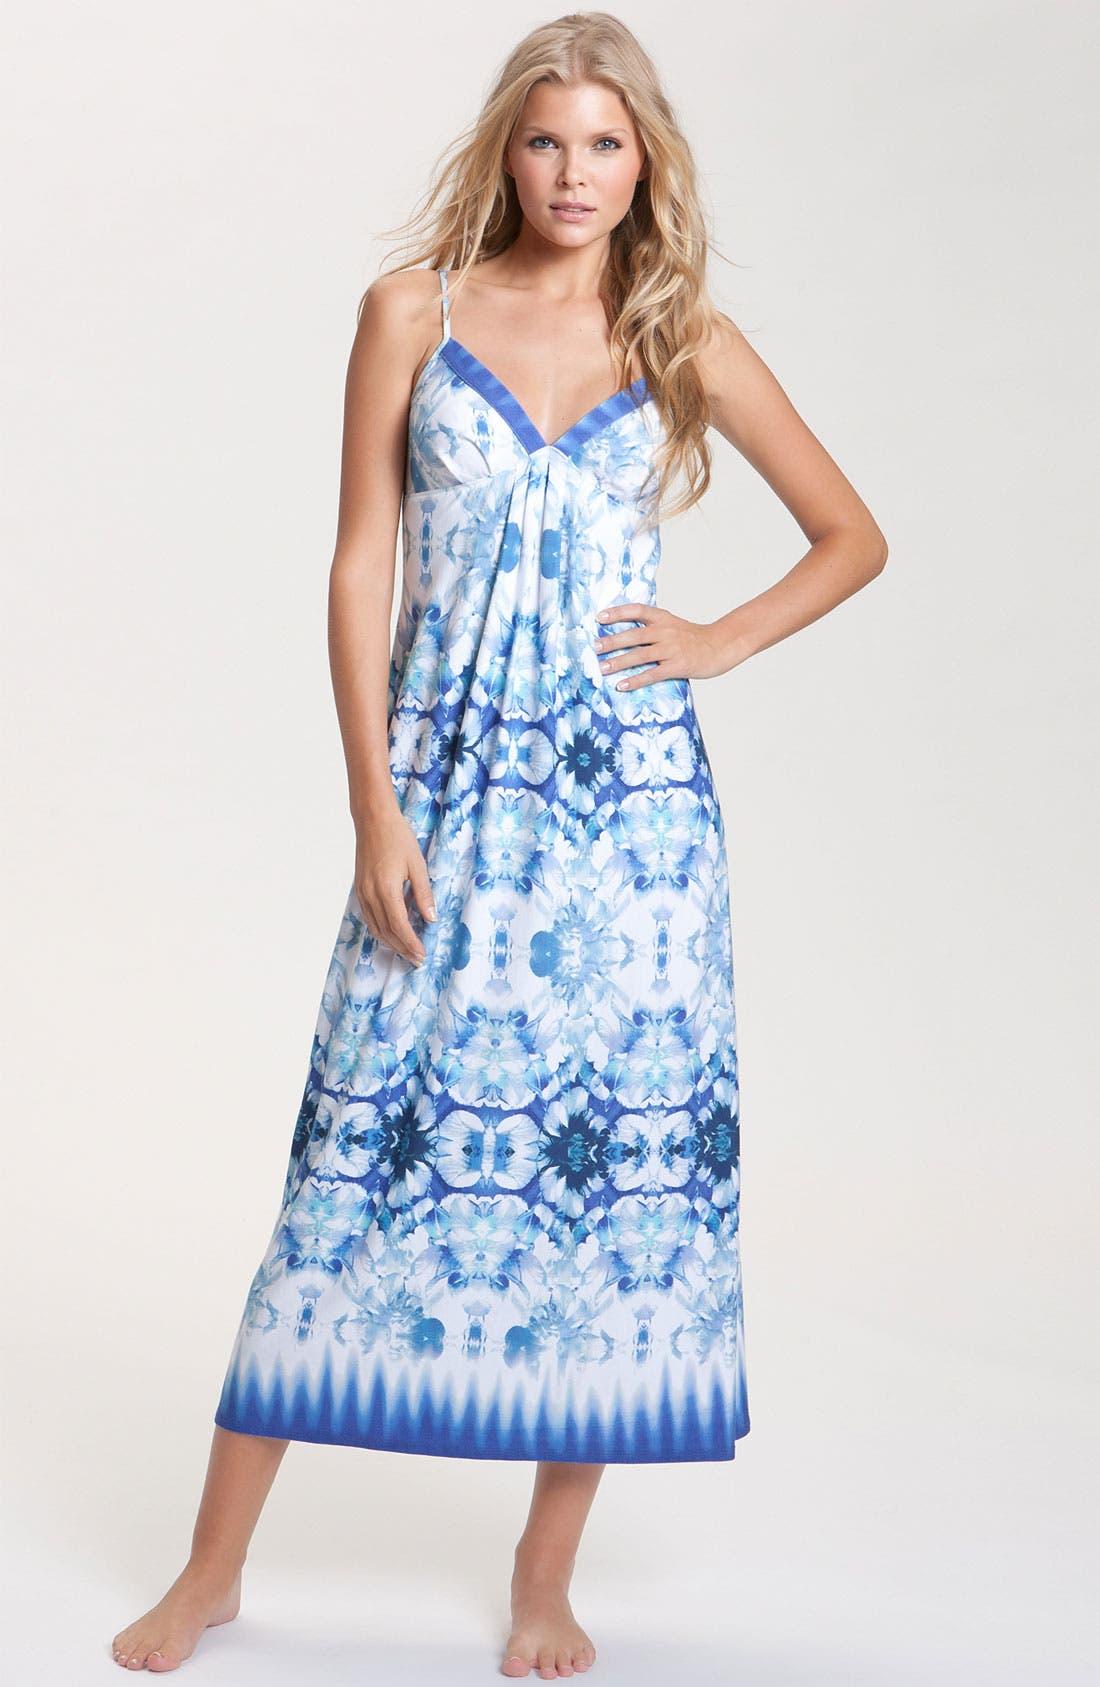 Alternate Image 1 Selected - Nicole Miller 'Petal Ombré' Nightgown